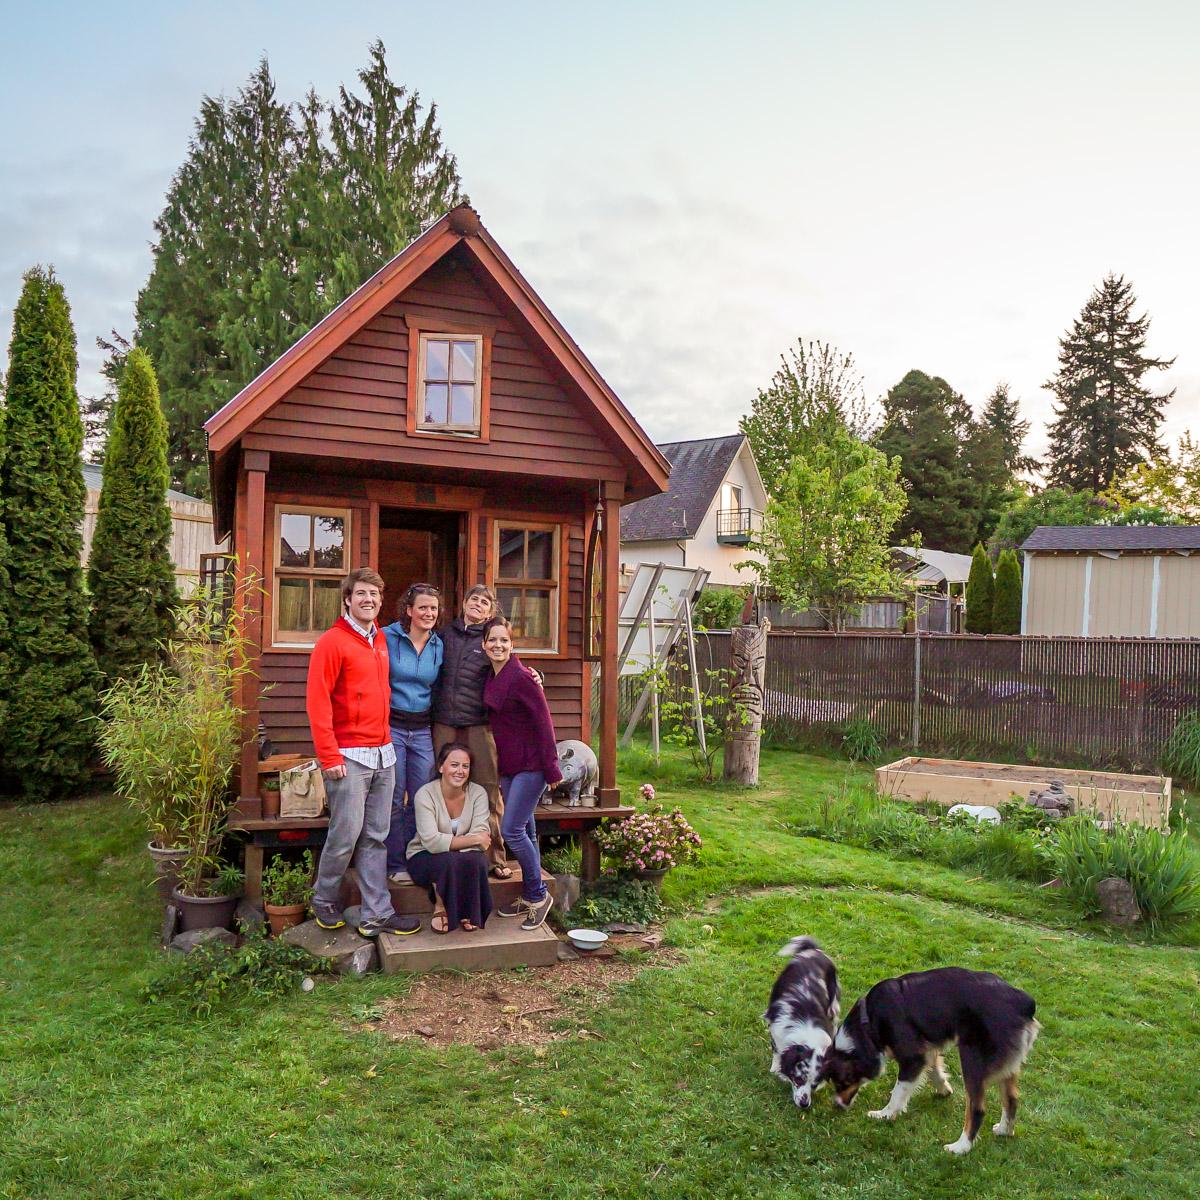 Olympia, WA: Mountain Goats & Tiny House Wrestling